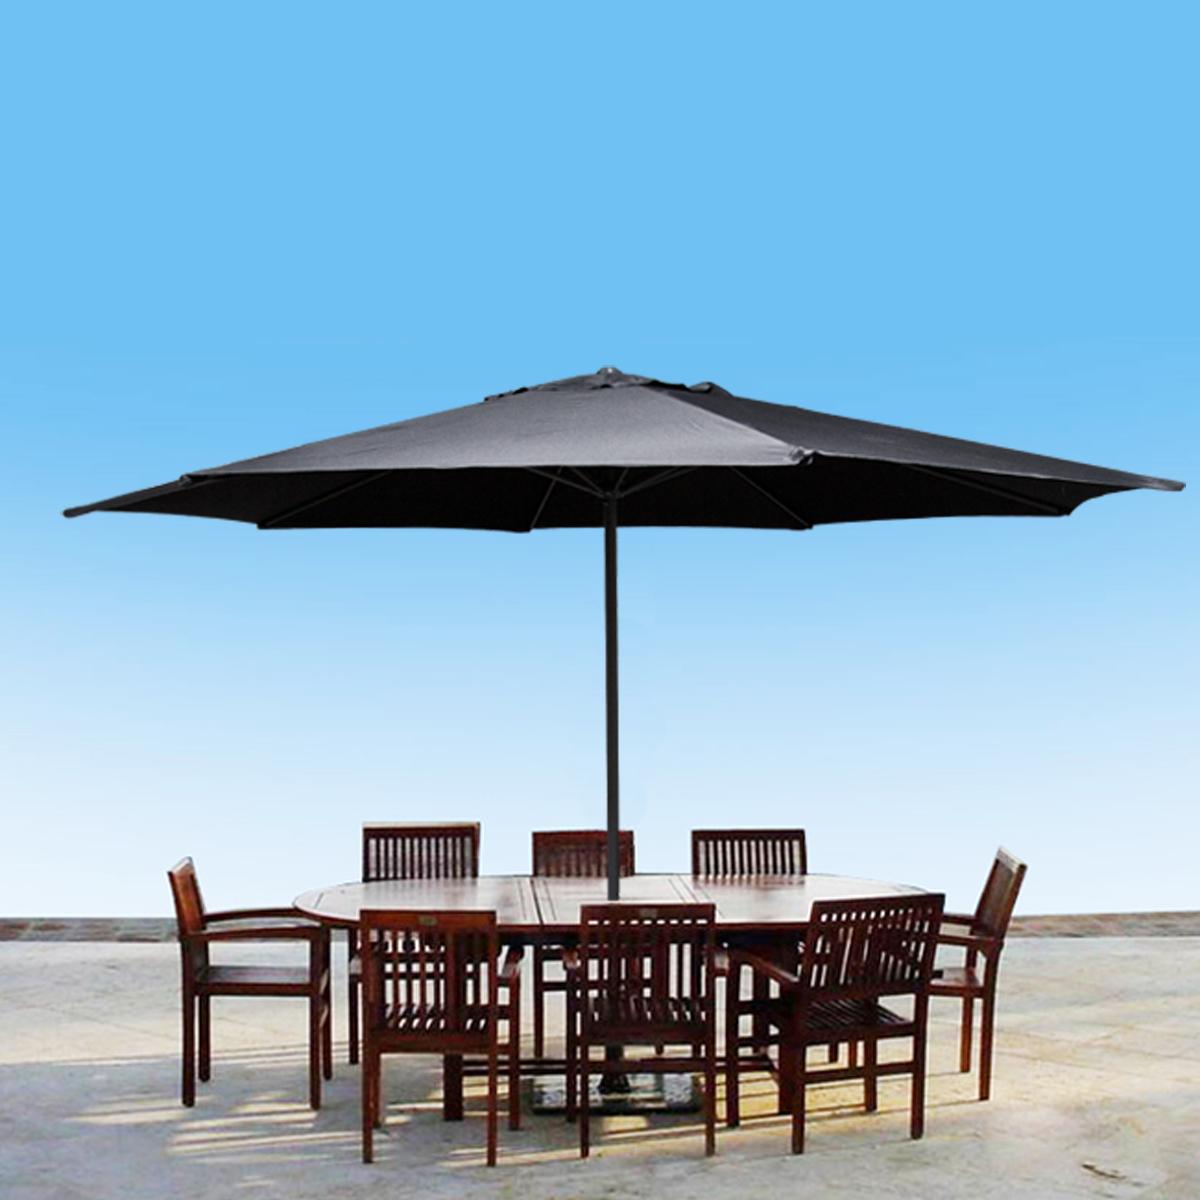 13 39 ft feet beige aluminum outdoor patio umbrella deck gazebo sun shade black ebay. Black Bedroom Furniture Sets. Home Design Ideas